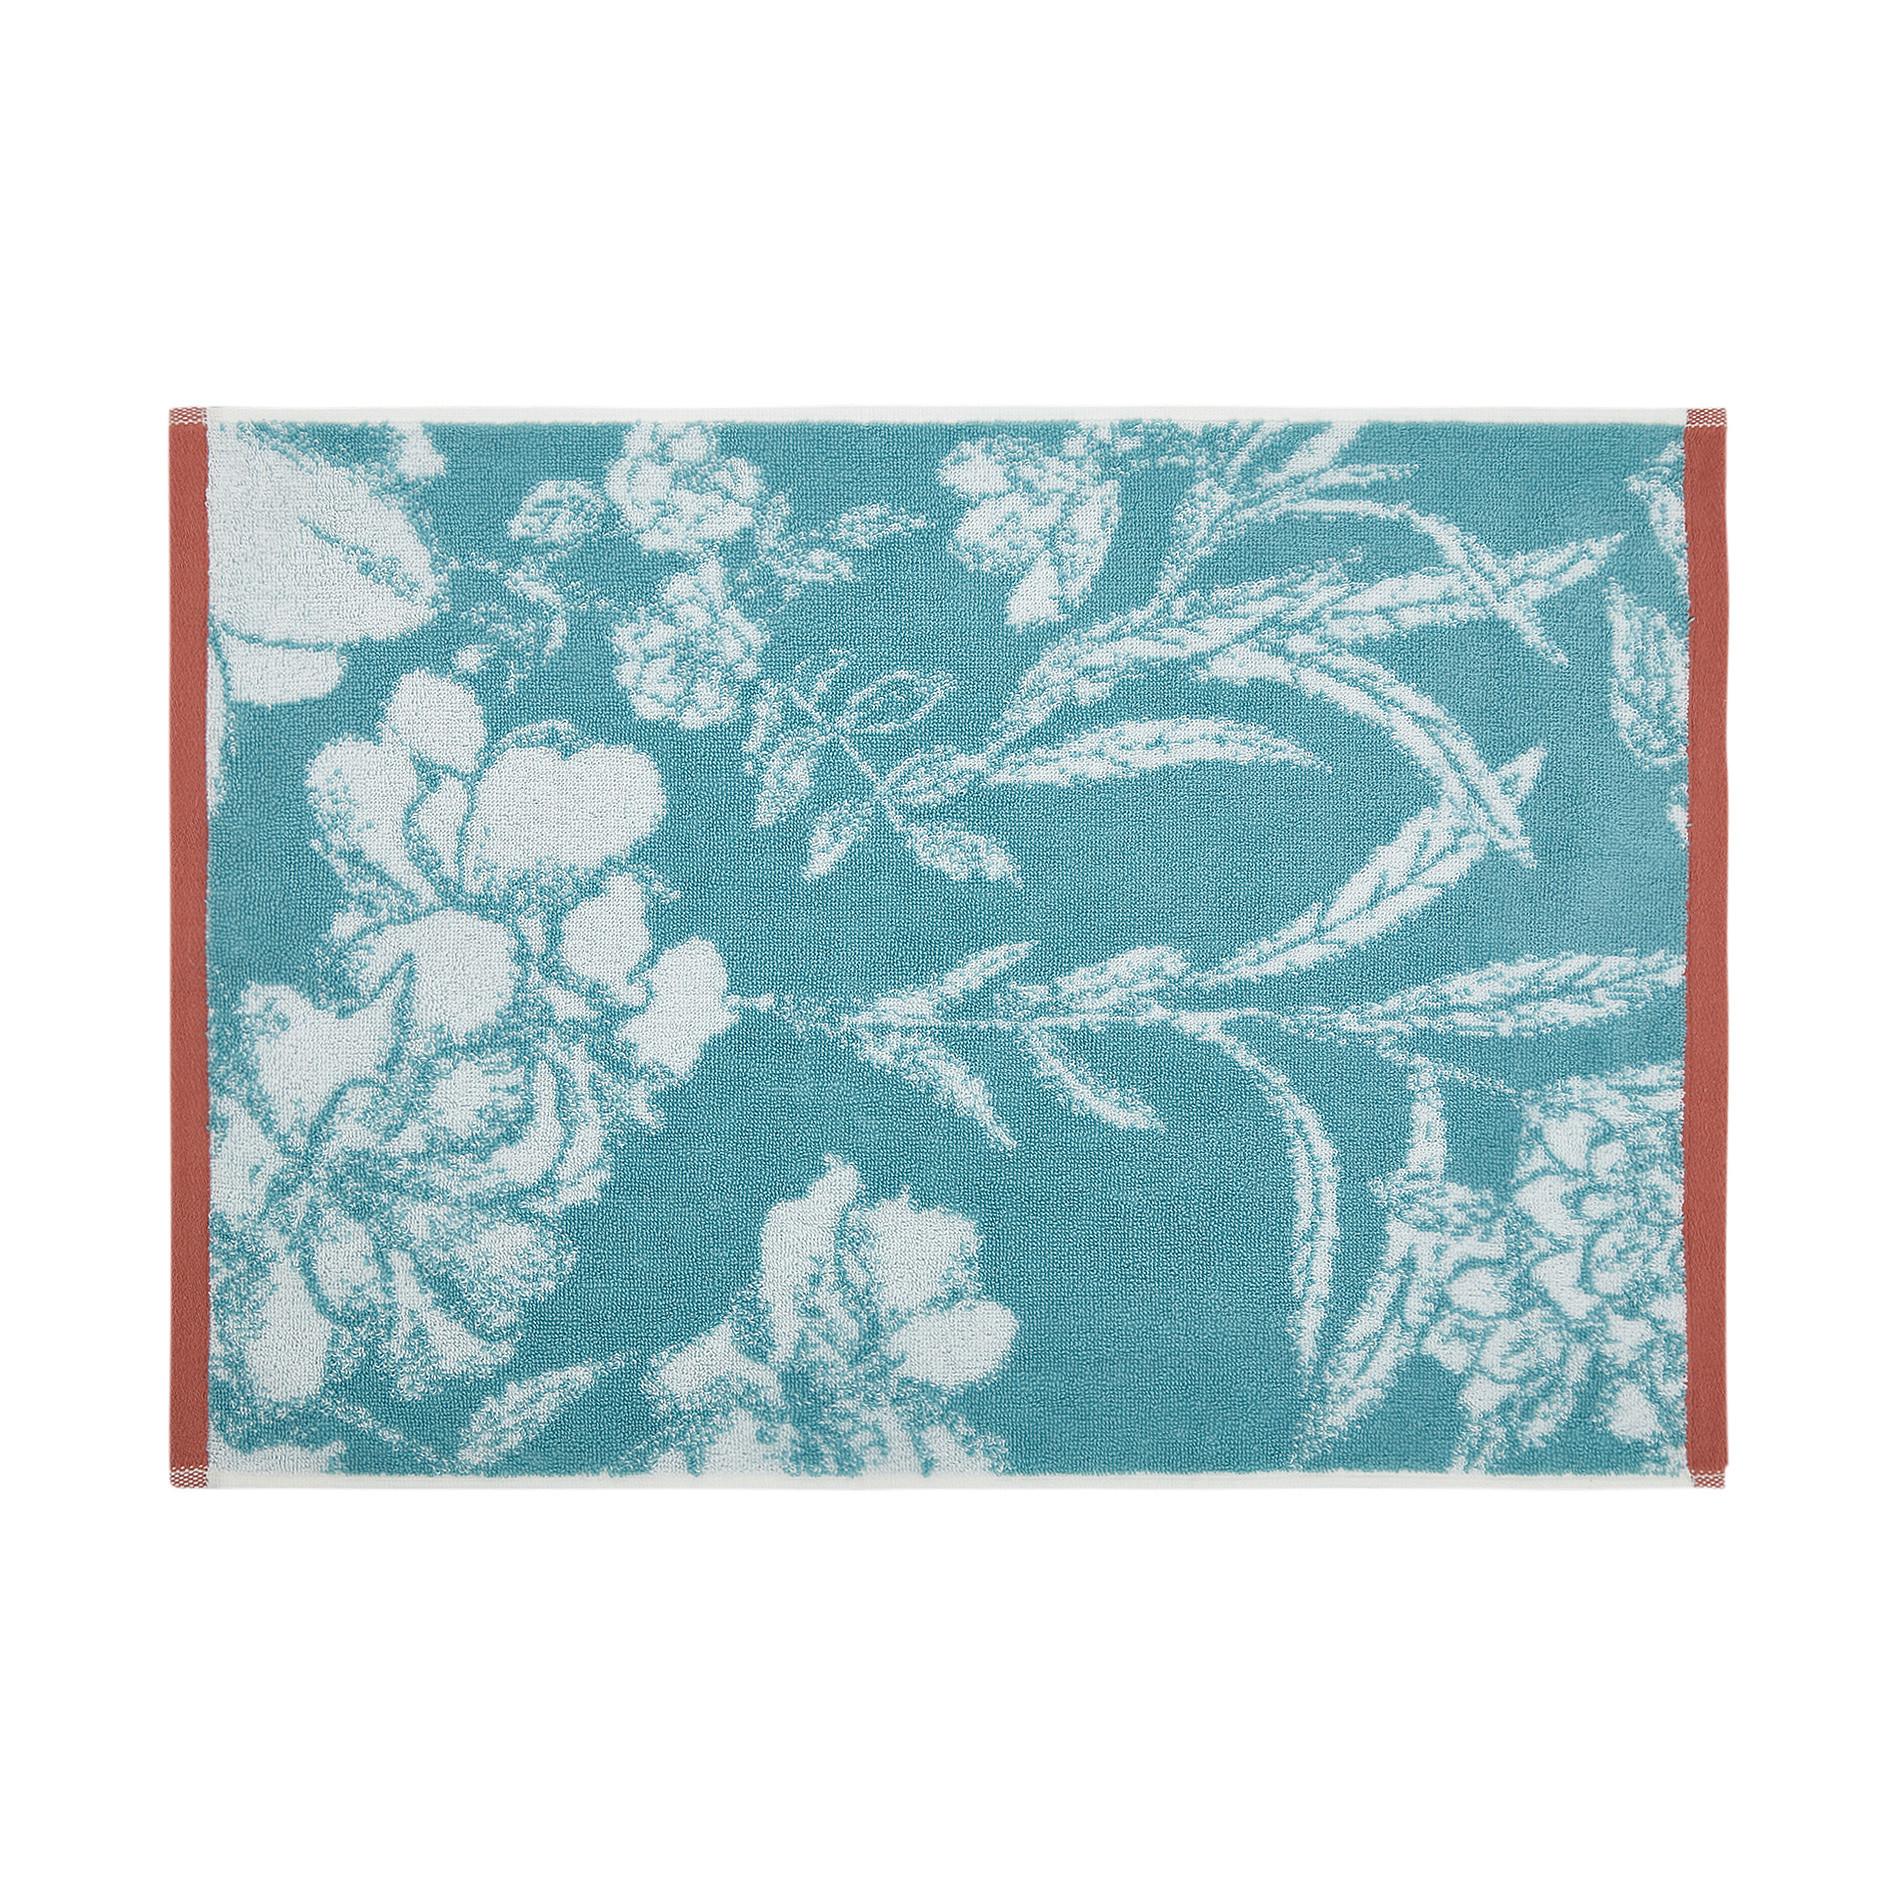 Asciugamano cotone biologico motivo floreale, Verde acqua, large image number 1